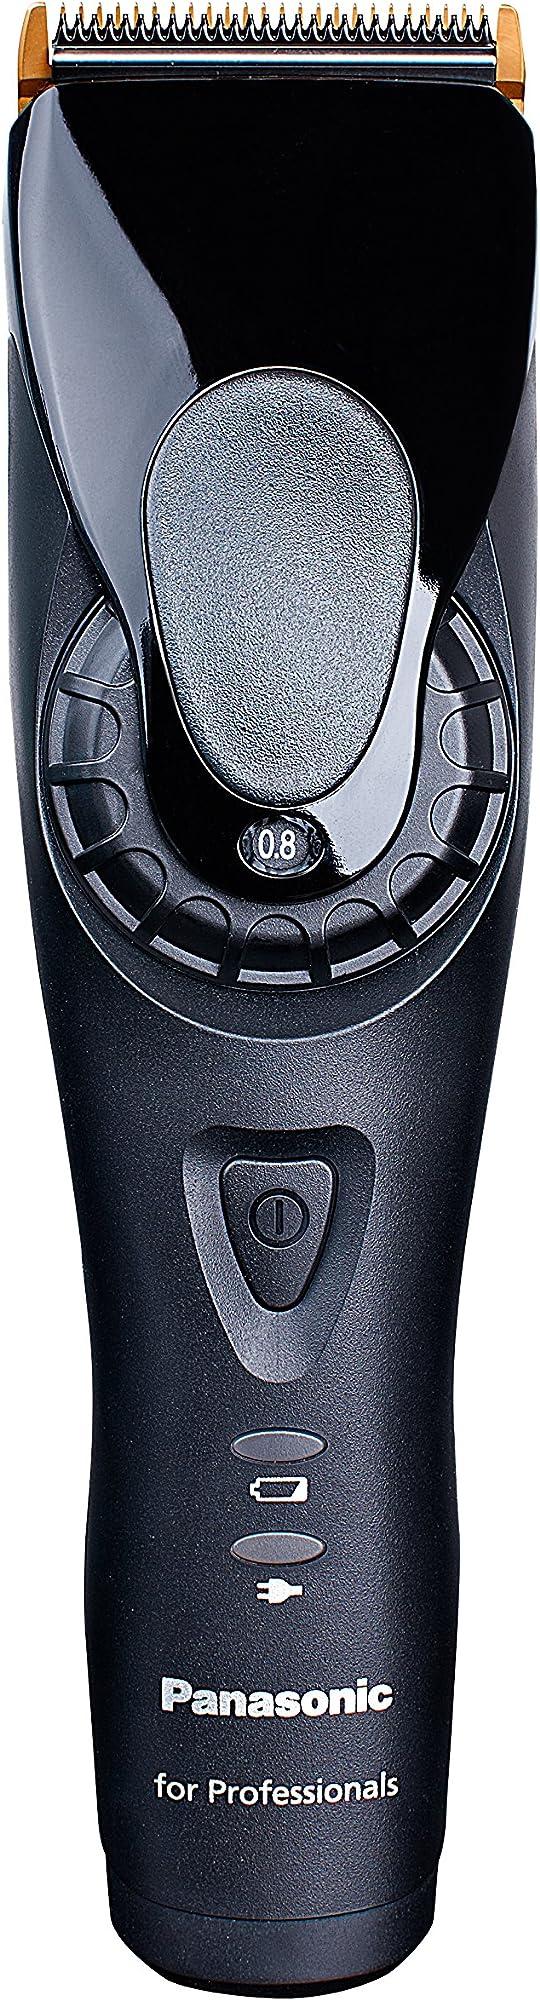 Panasonic, tagliacapelli professionale K-6110